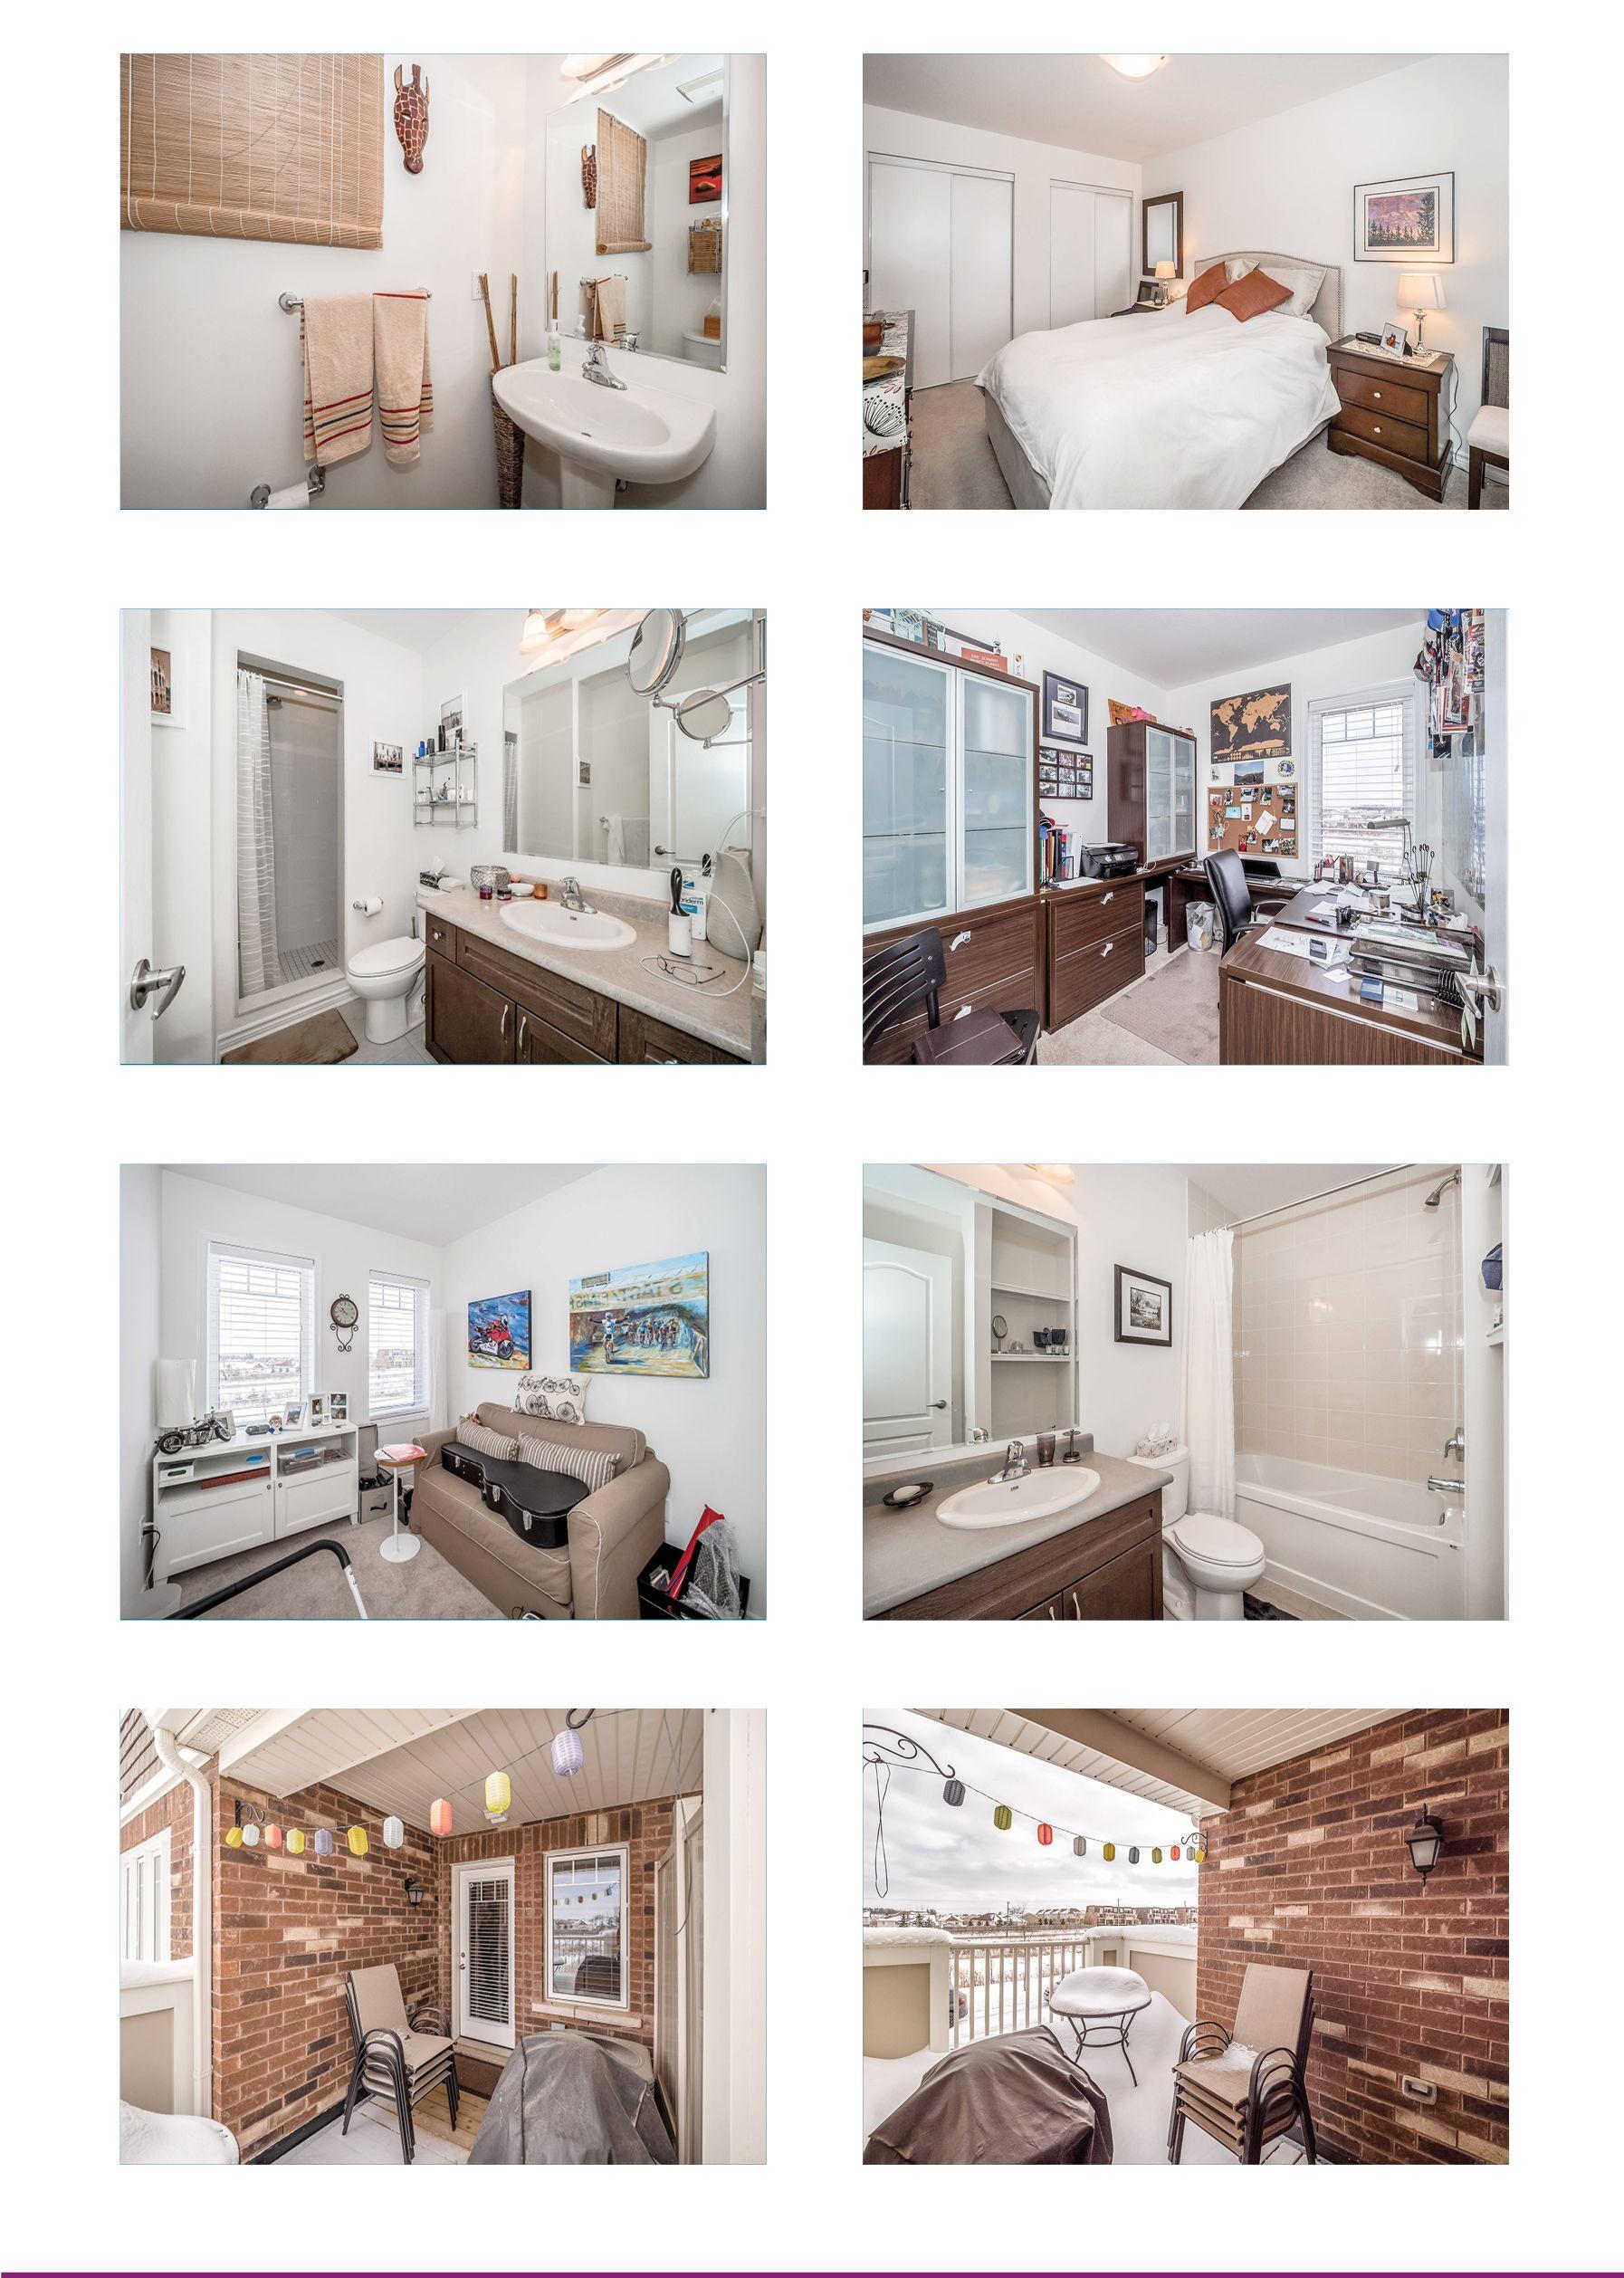 20 Gorgeous 1 Bedroom Basement Apartment Guelph Ideas